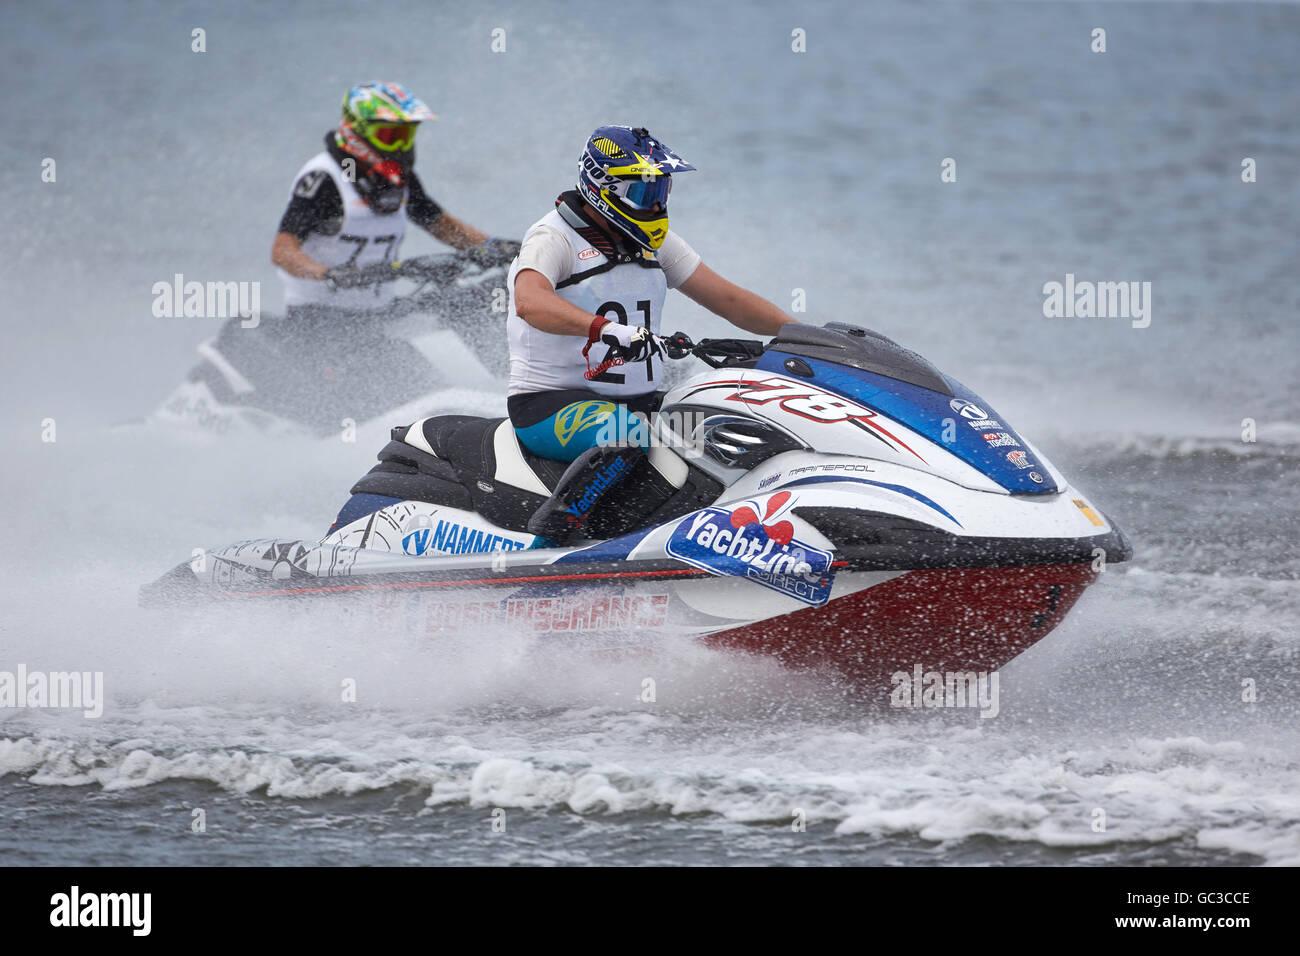 Jet ski races, Brodenbach, Rhineland-Palatinate, Germany - Stock Image